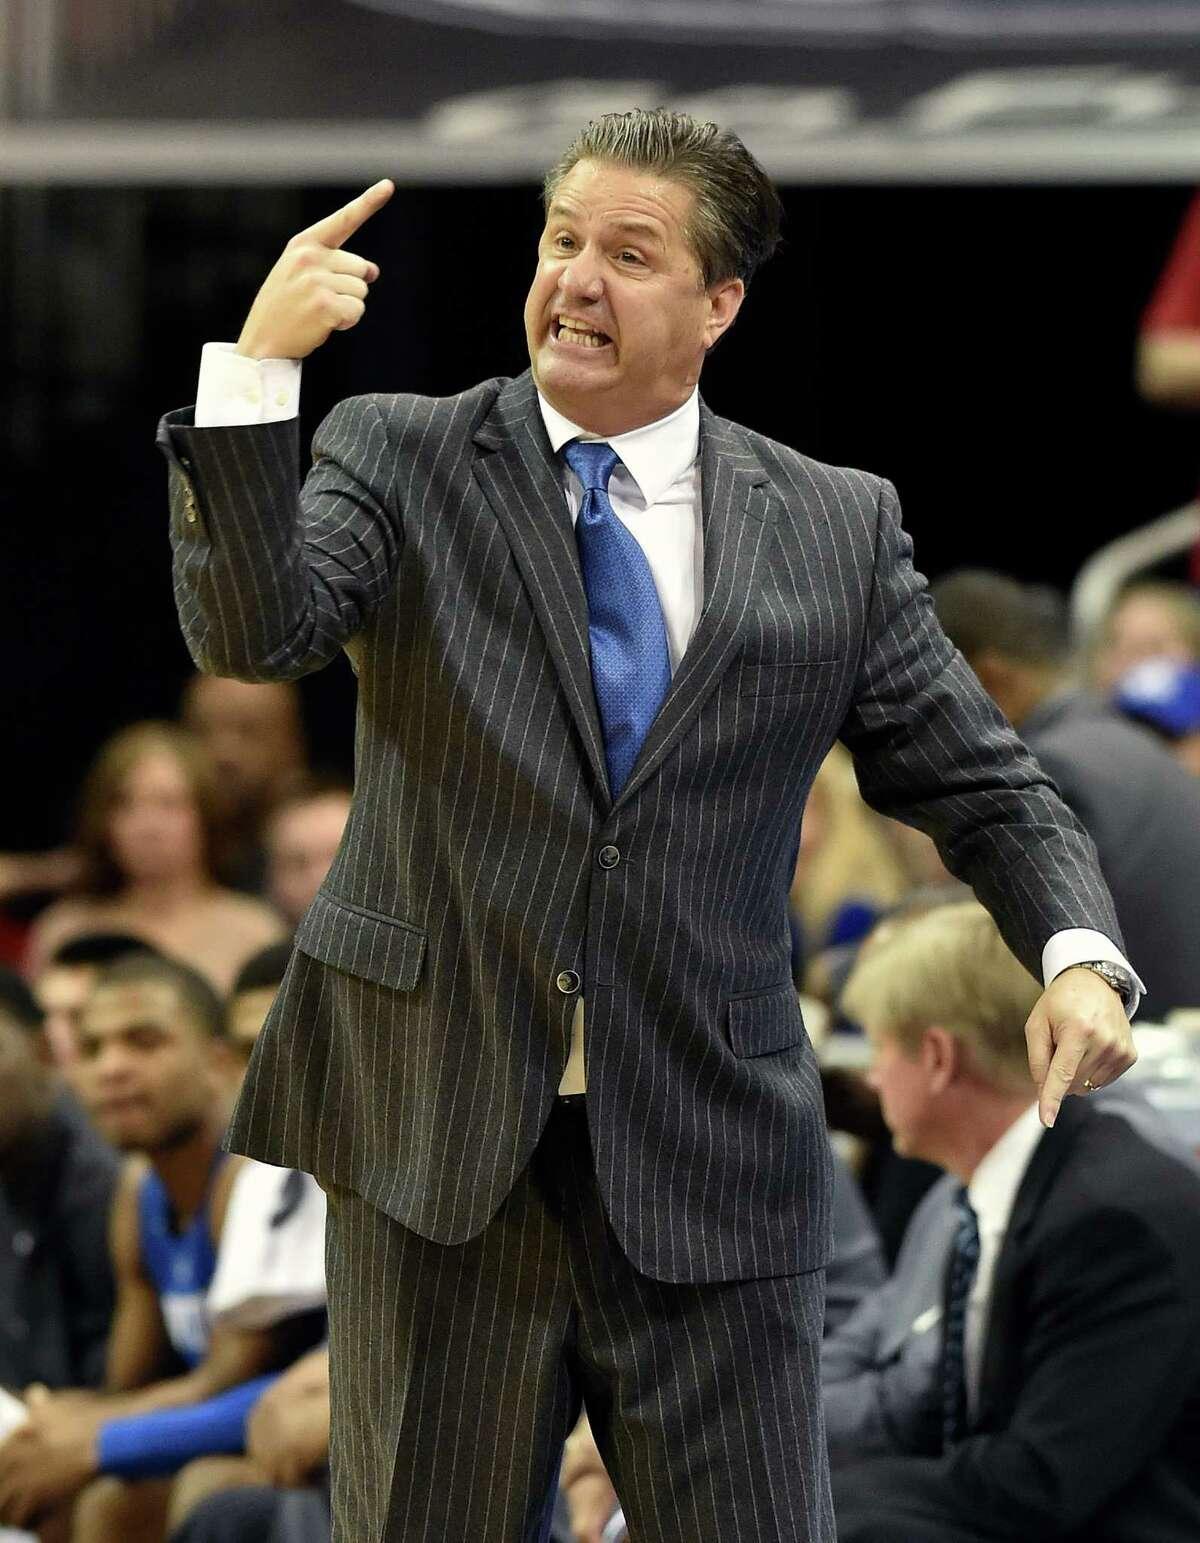 Kentucky's fiery John Calipari often has top recruiting classes.